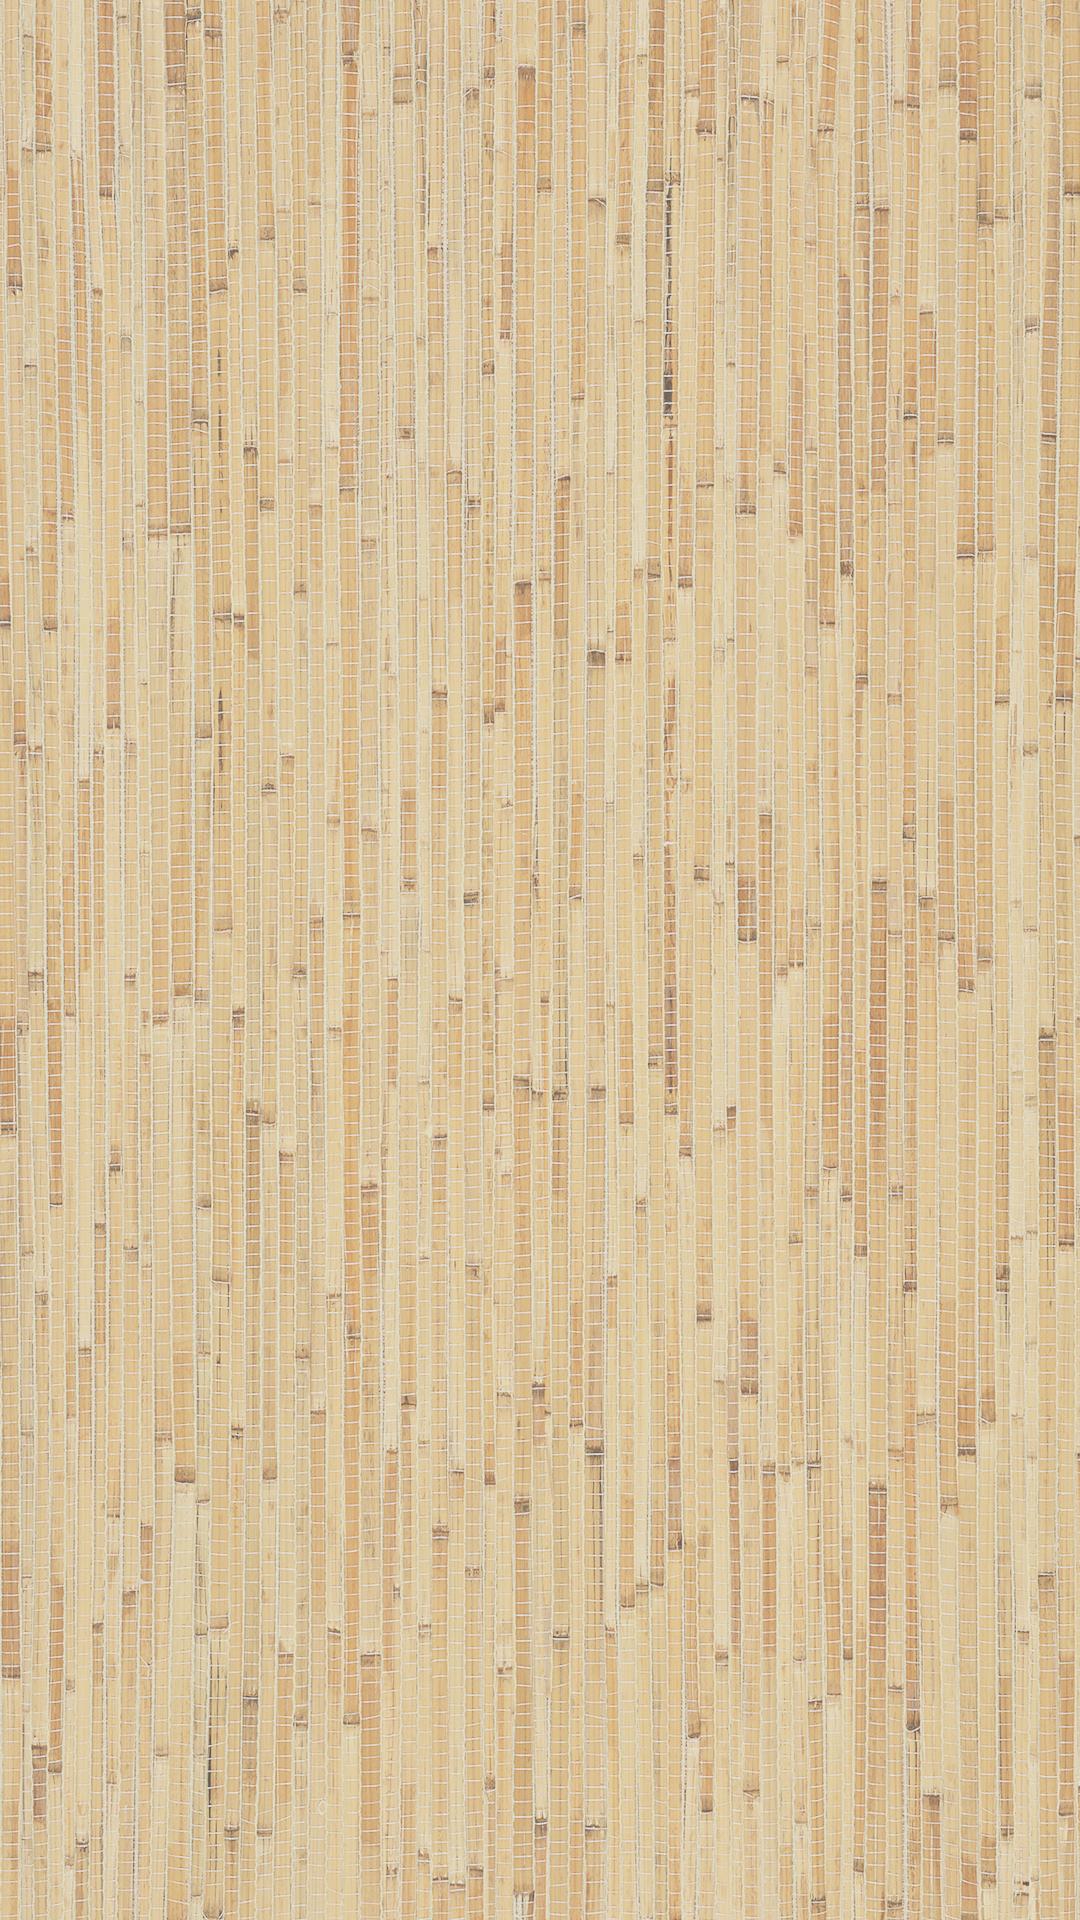 Tekstur Kayu Pola Coklat Wallpaper Sc Iphone7plus